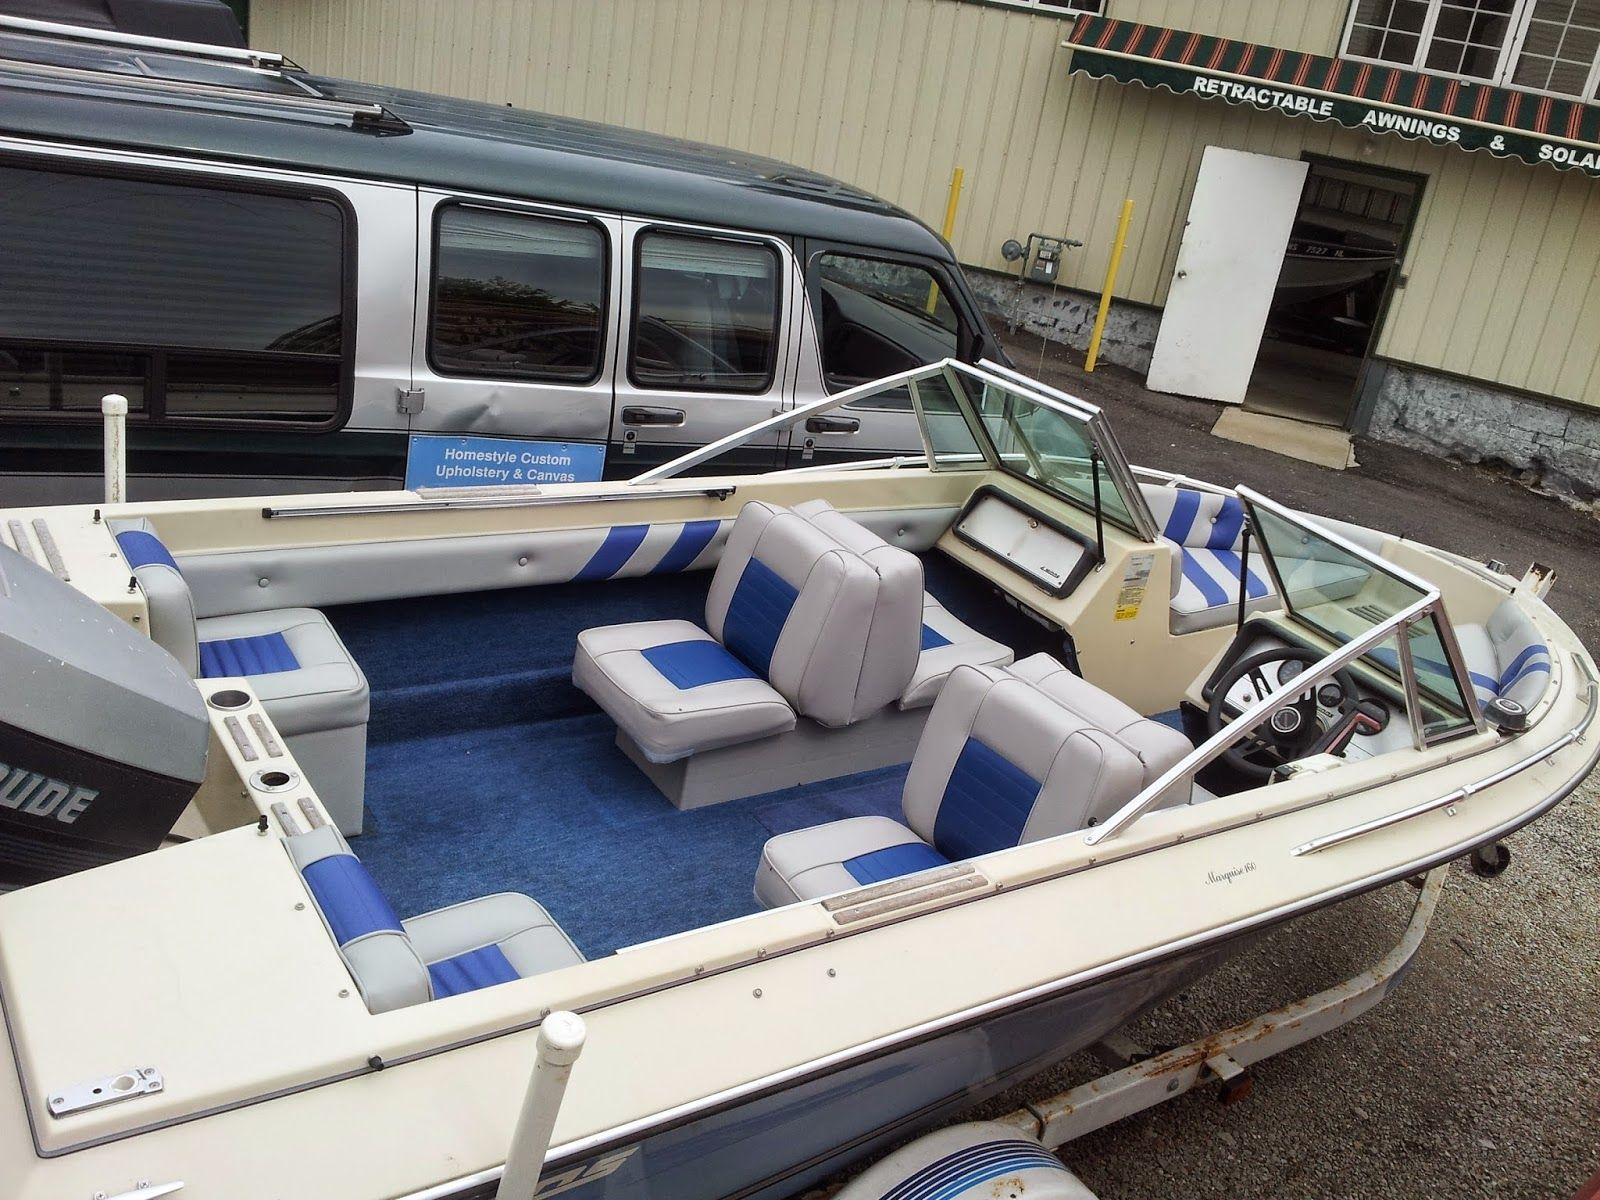 Two Tone Boat Interiors Google Search Boat Restoration Boat Interior Boat Projects